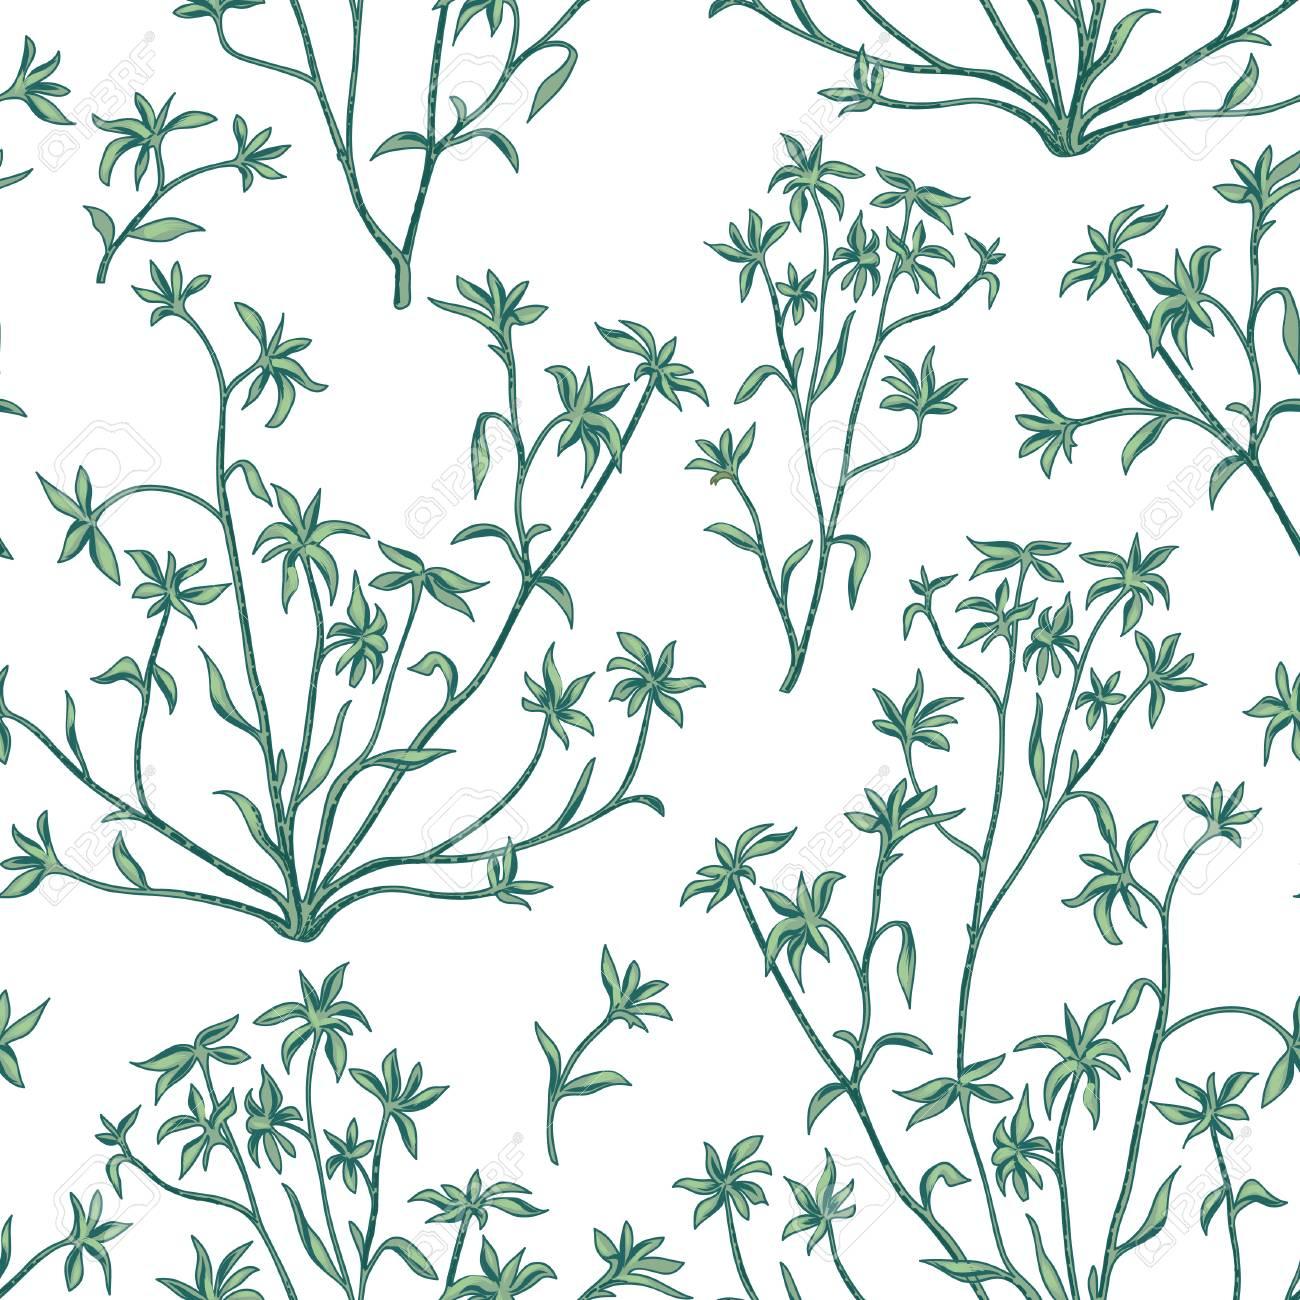 Hojas Florales Patron Transparente Naturaleza Muerta Fondo Plano Fondo De Pantalla Con Flores